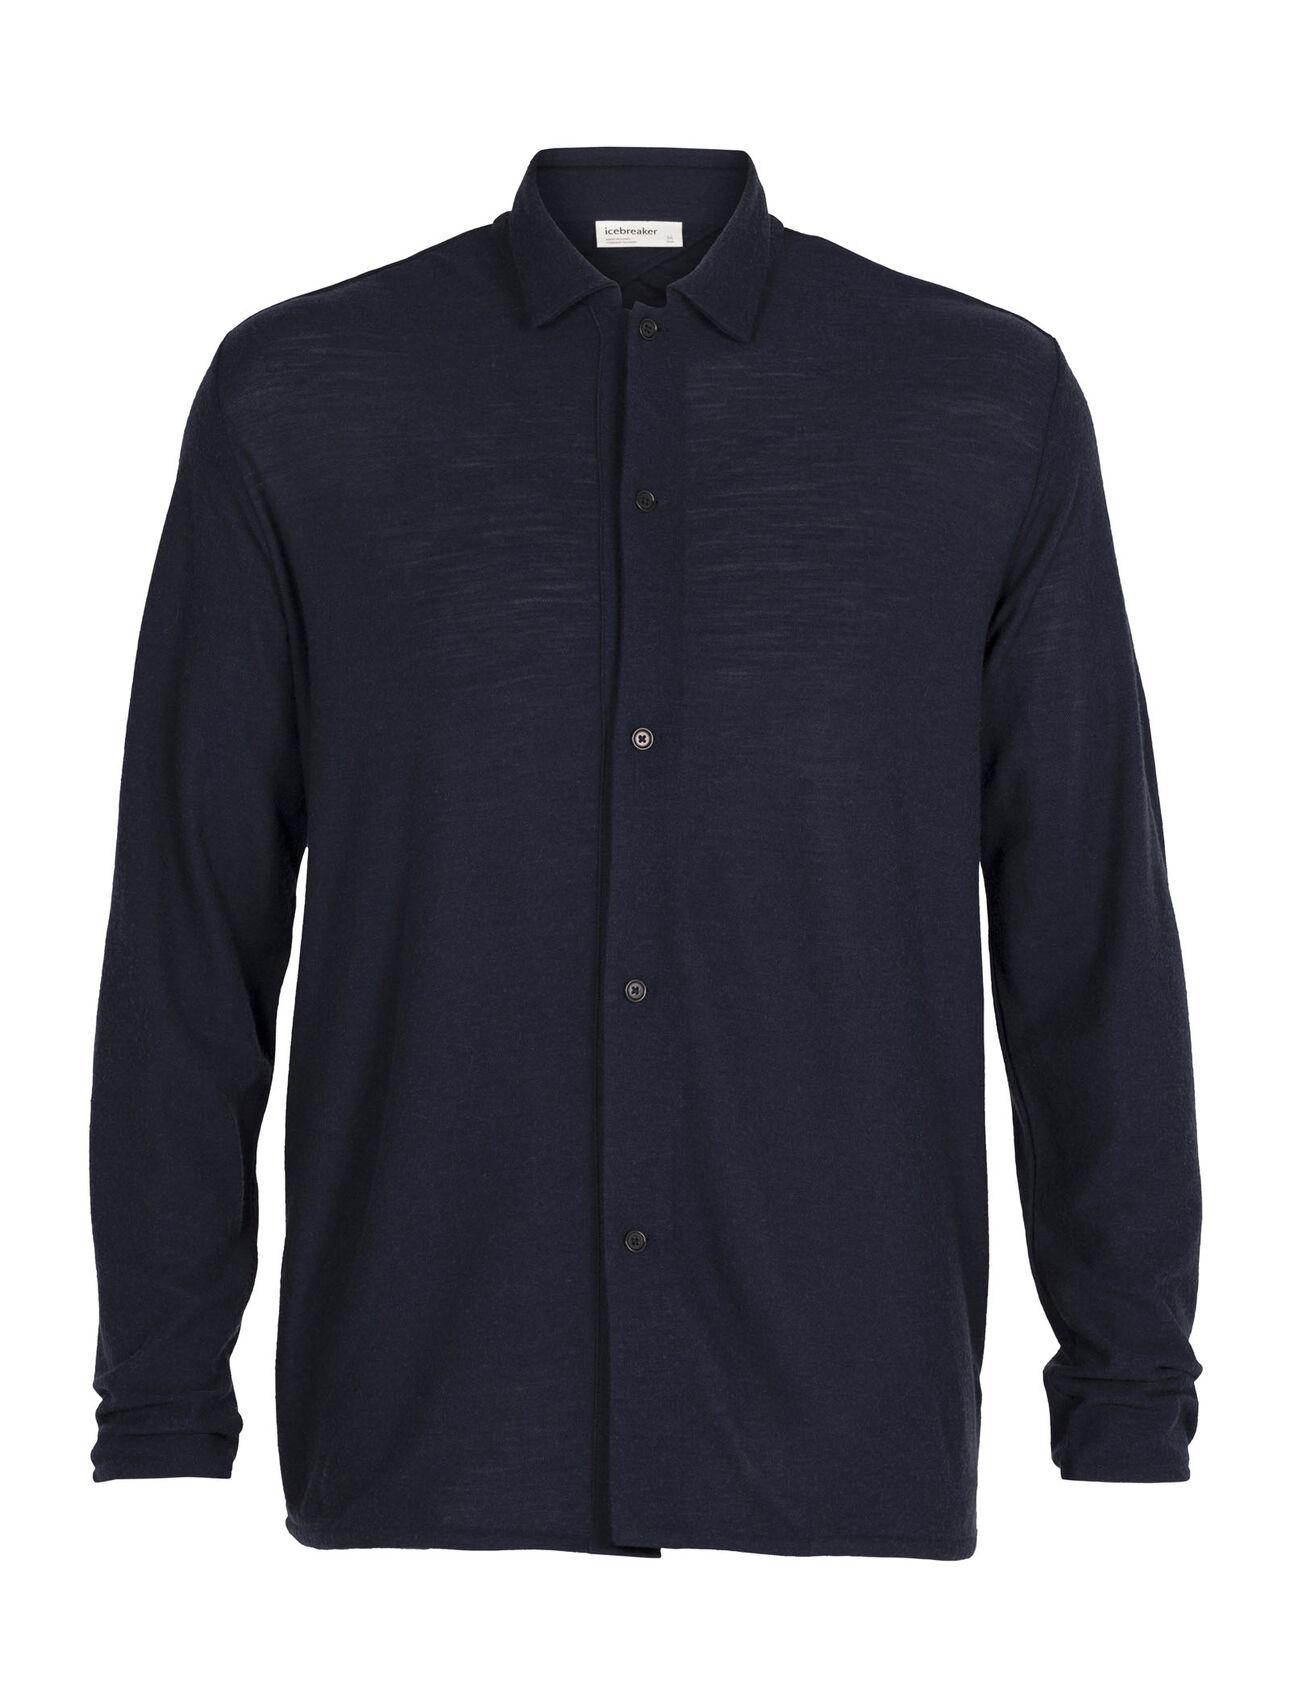 Merino 180 Pique Shirt Jacket